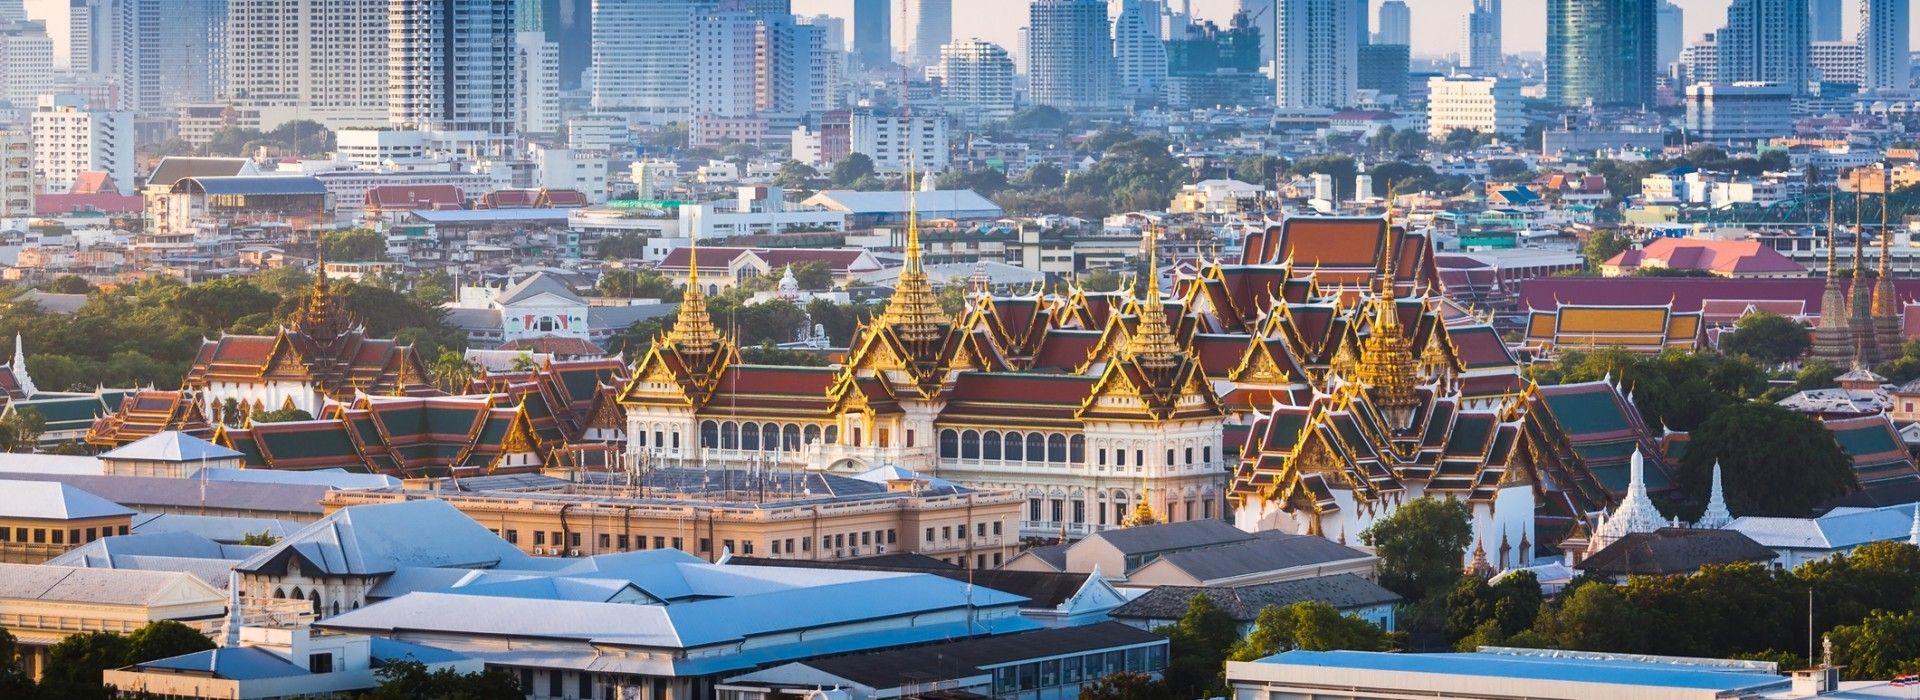 Southeast Asia cruise tours will take you to various countries like Singapore, Hong Kong, South Korea, Shanghai, Vietnam, Thailand and Indonesia.